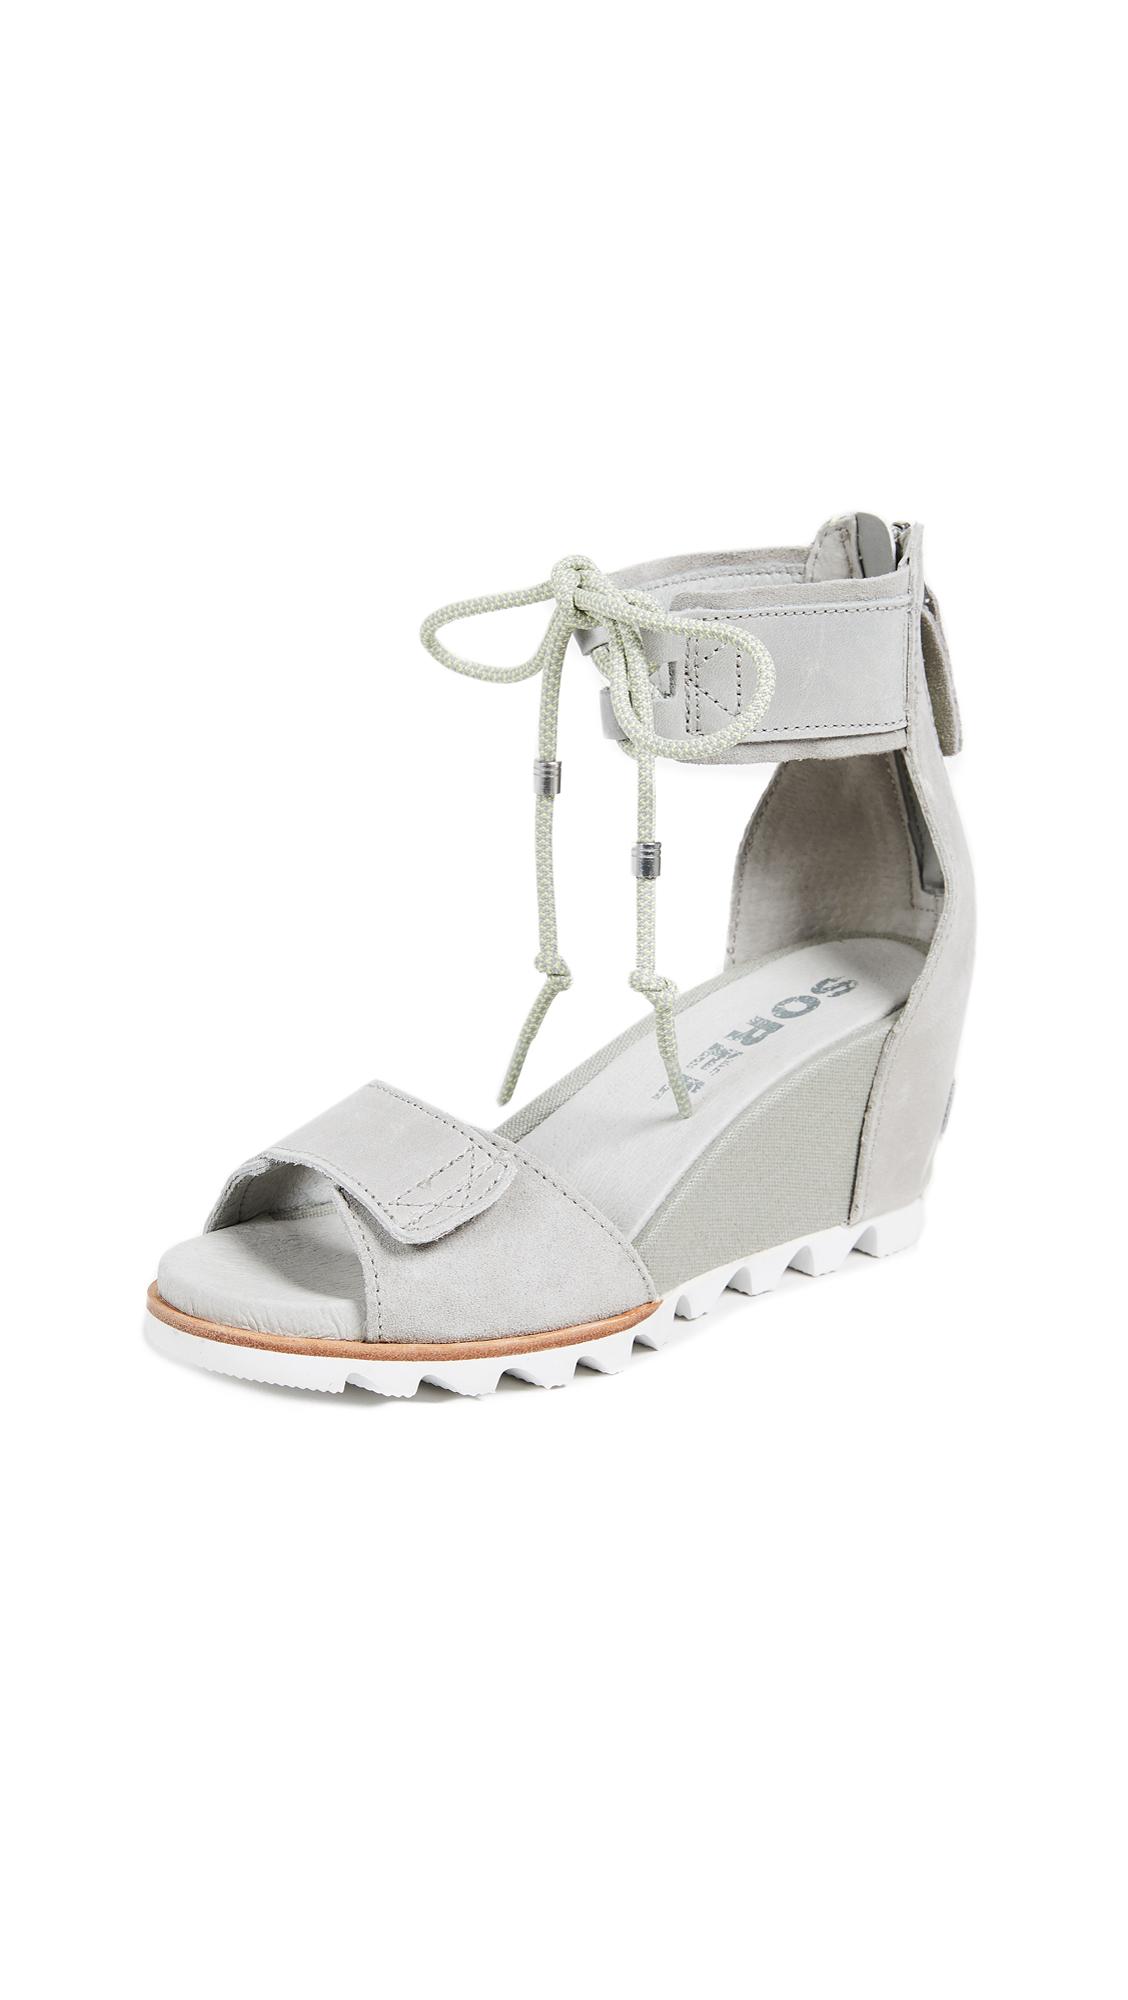 Sorel Joanie Ankle Lace Sandals - Dove